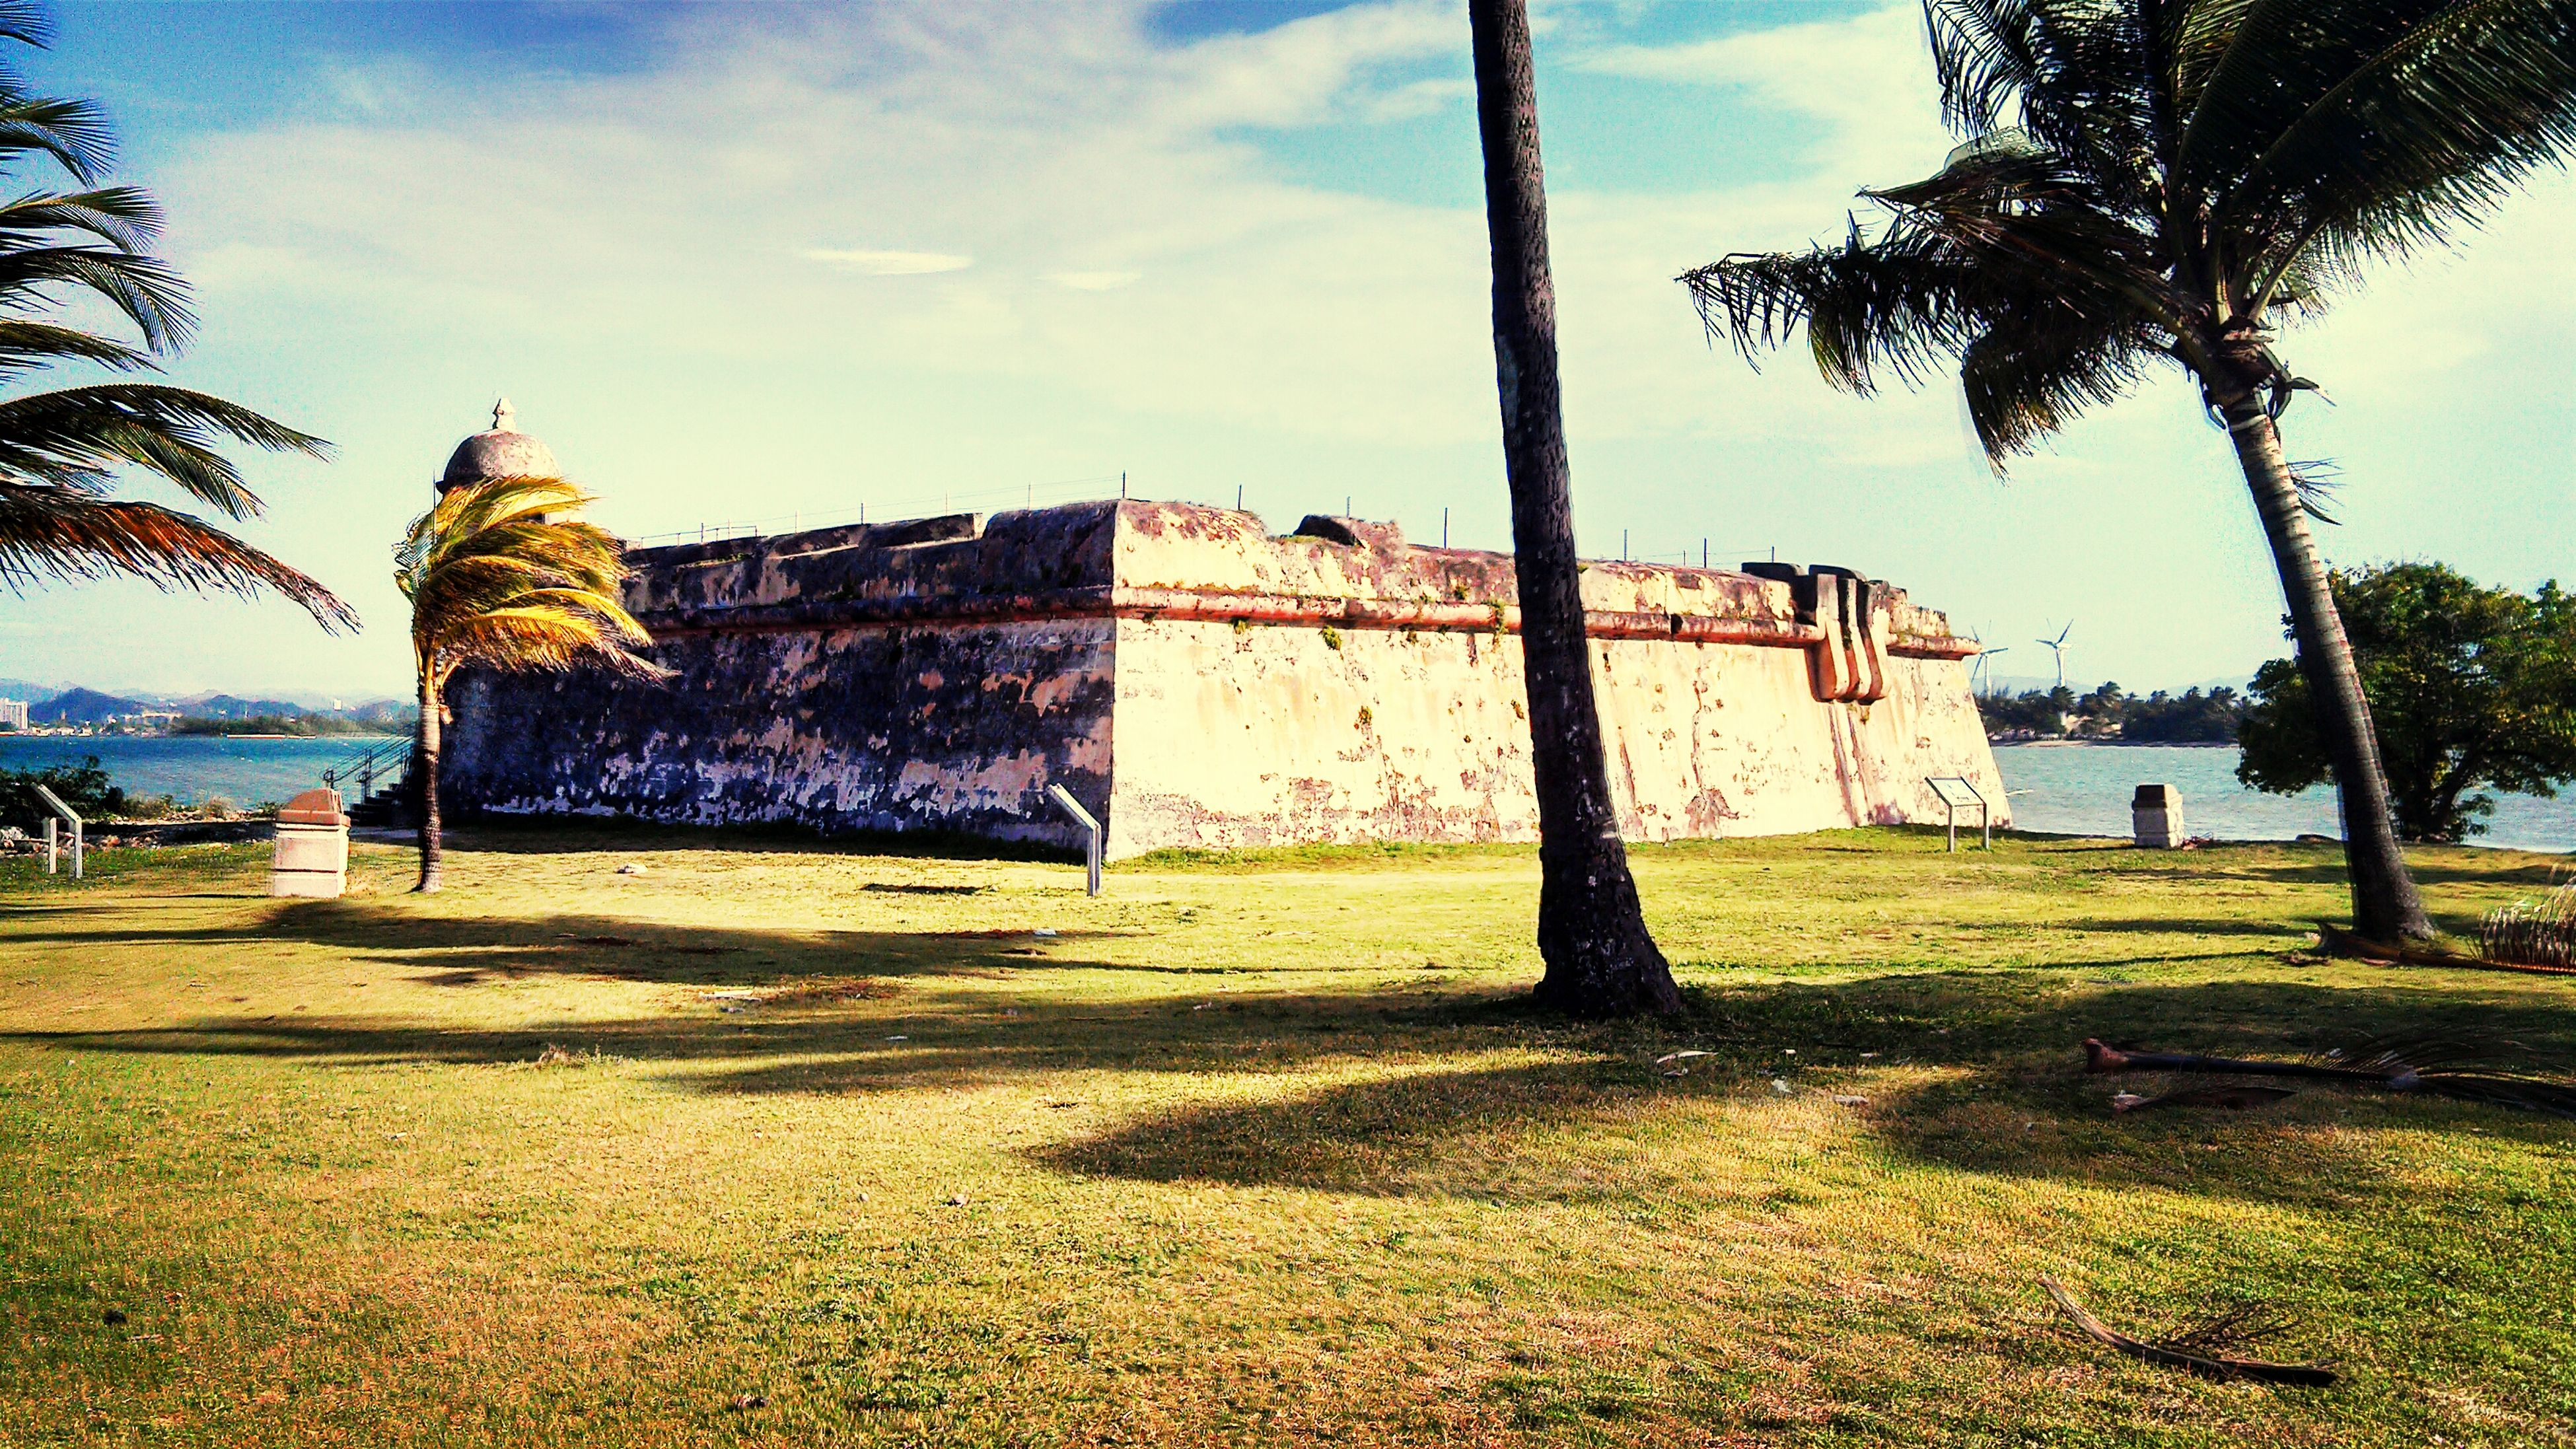 Isla de cabras Historical Building Fortin My Island Turism